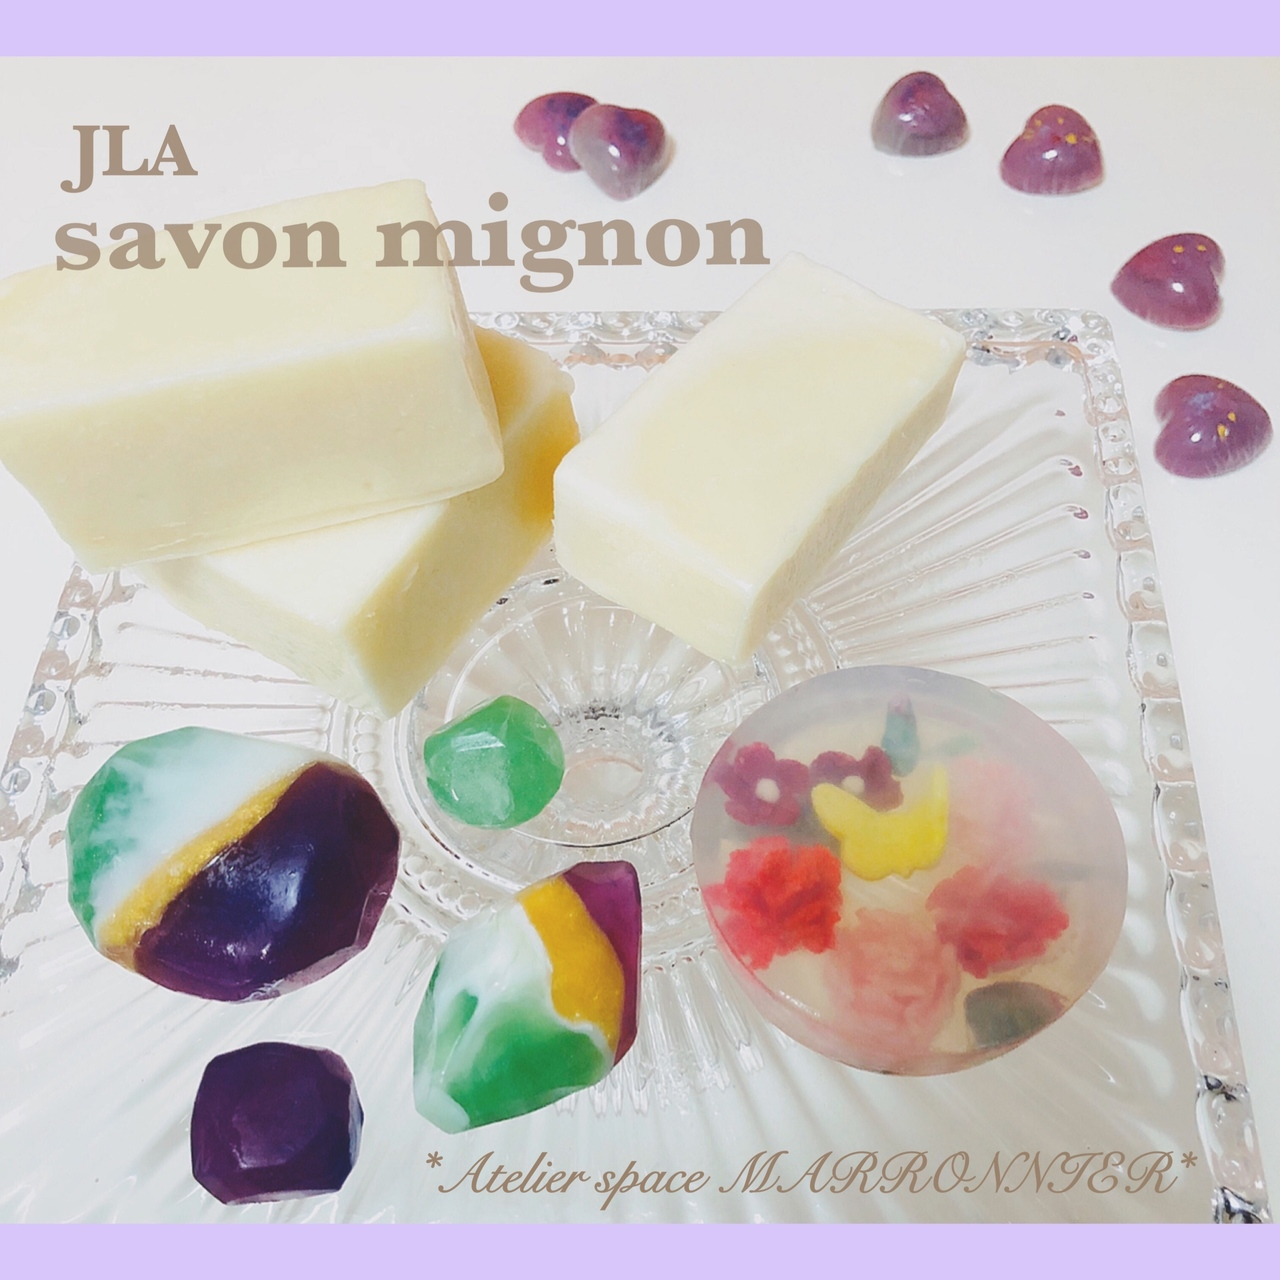 ★JLA【savon mignon(サボン ミニヨン)認定講座】